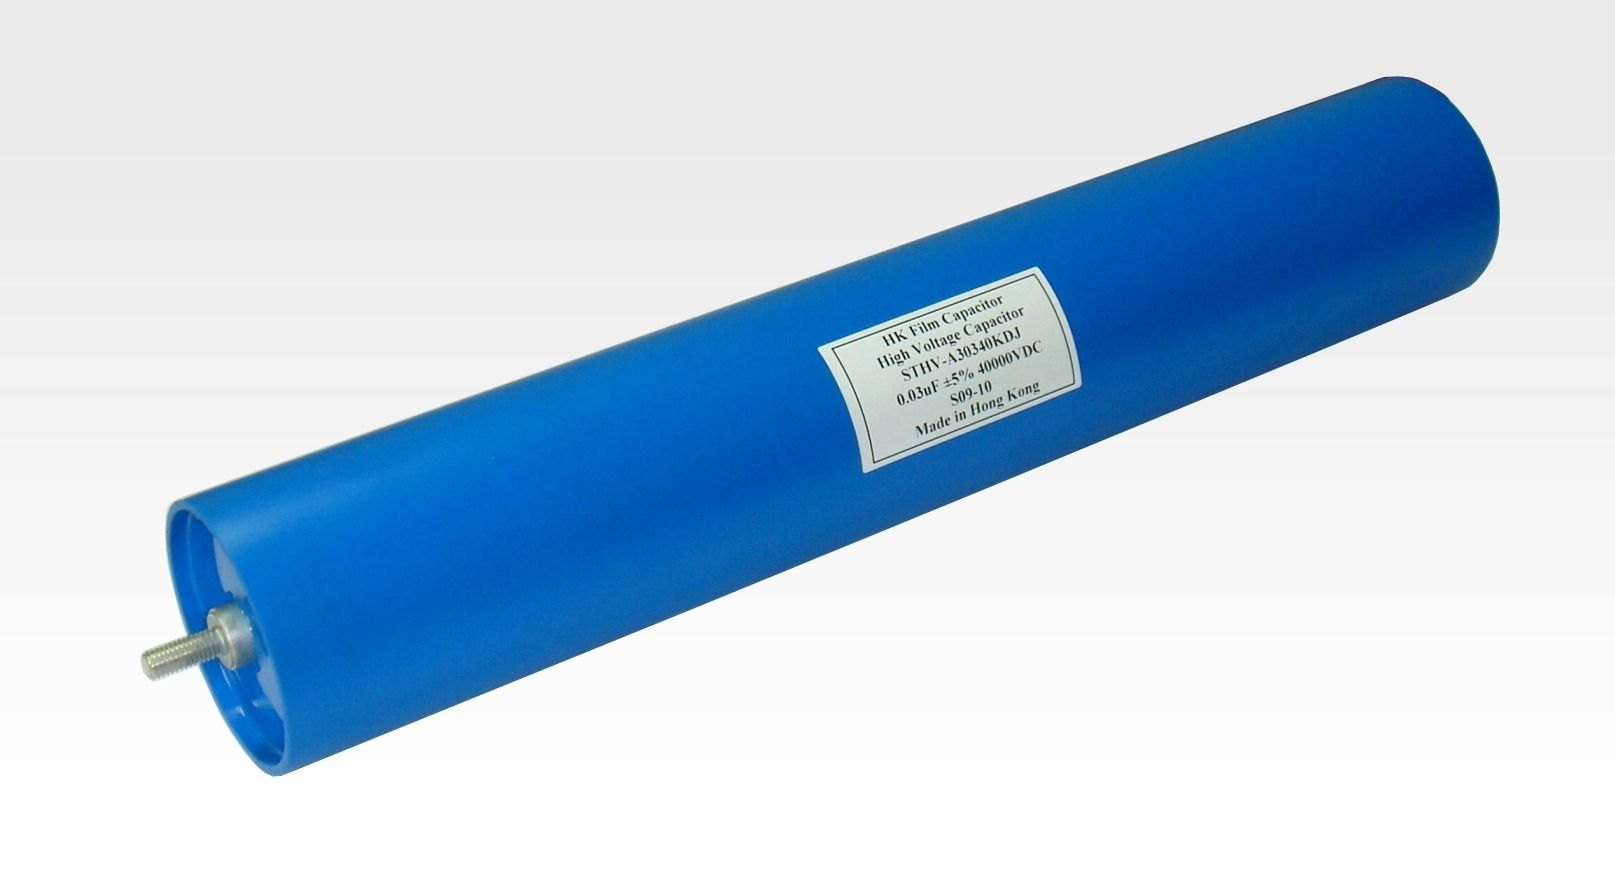 film capacitor cylindrical filter ac sthvf hk film film capacitor cylindrical filter ac sthvf